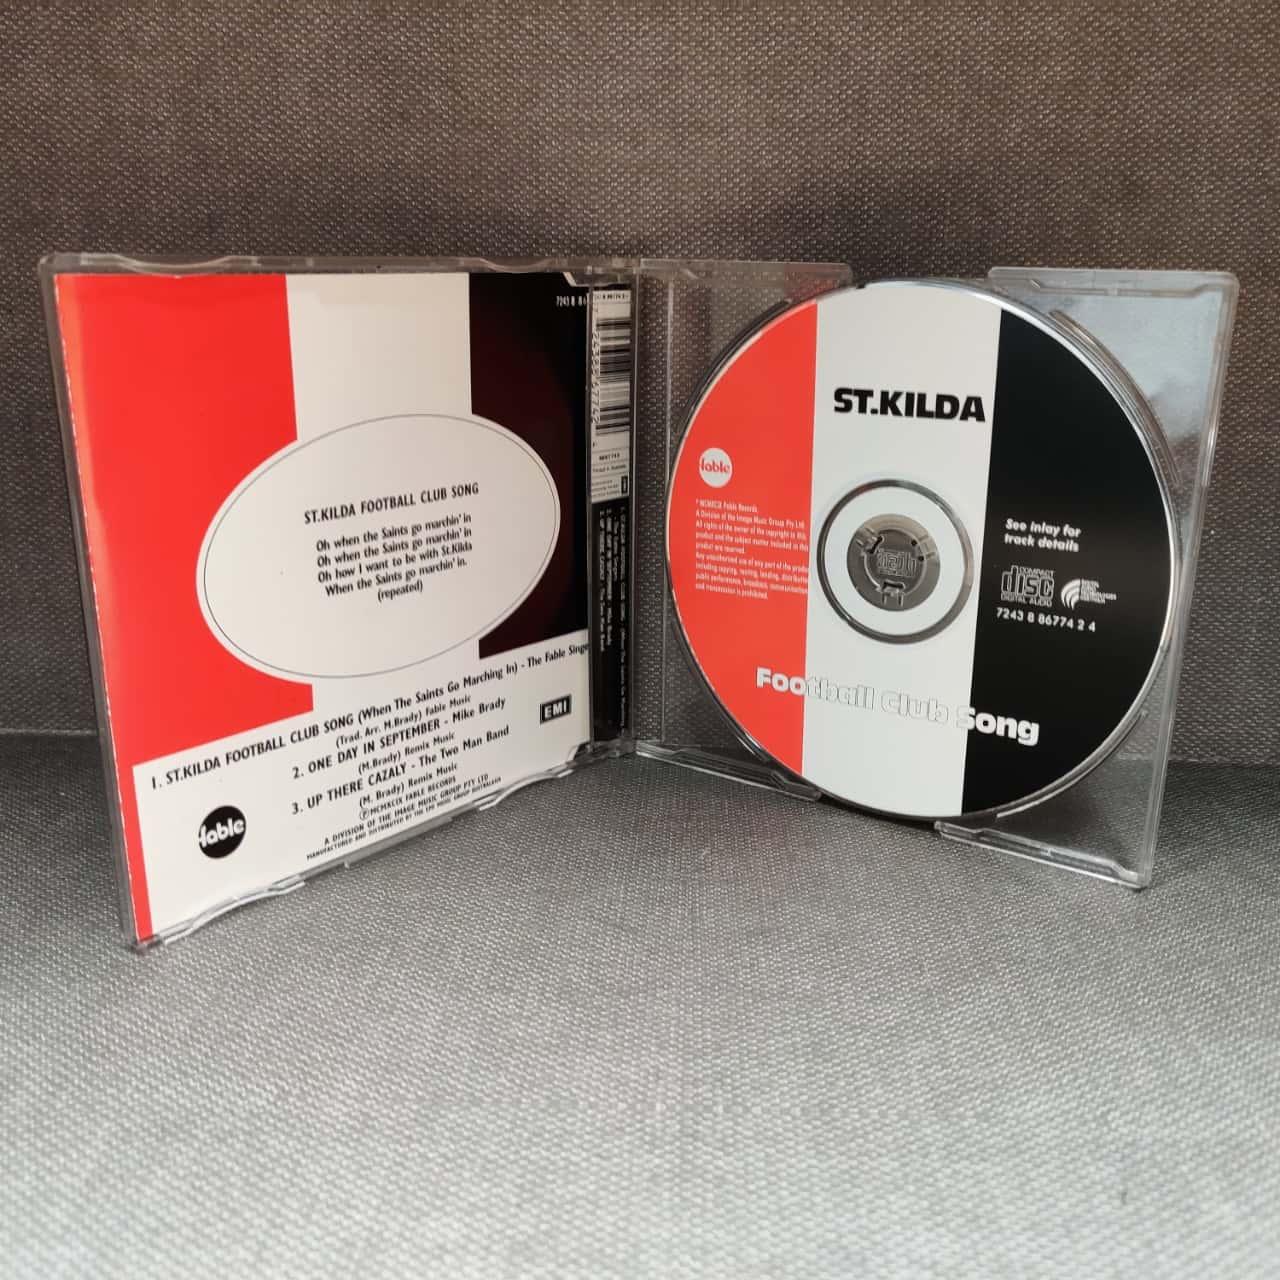 St Kilda Football Club Song CD